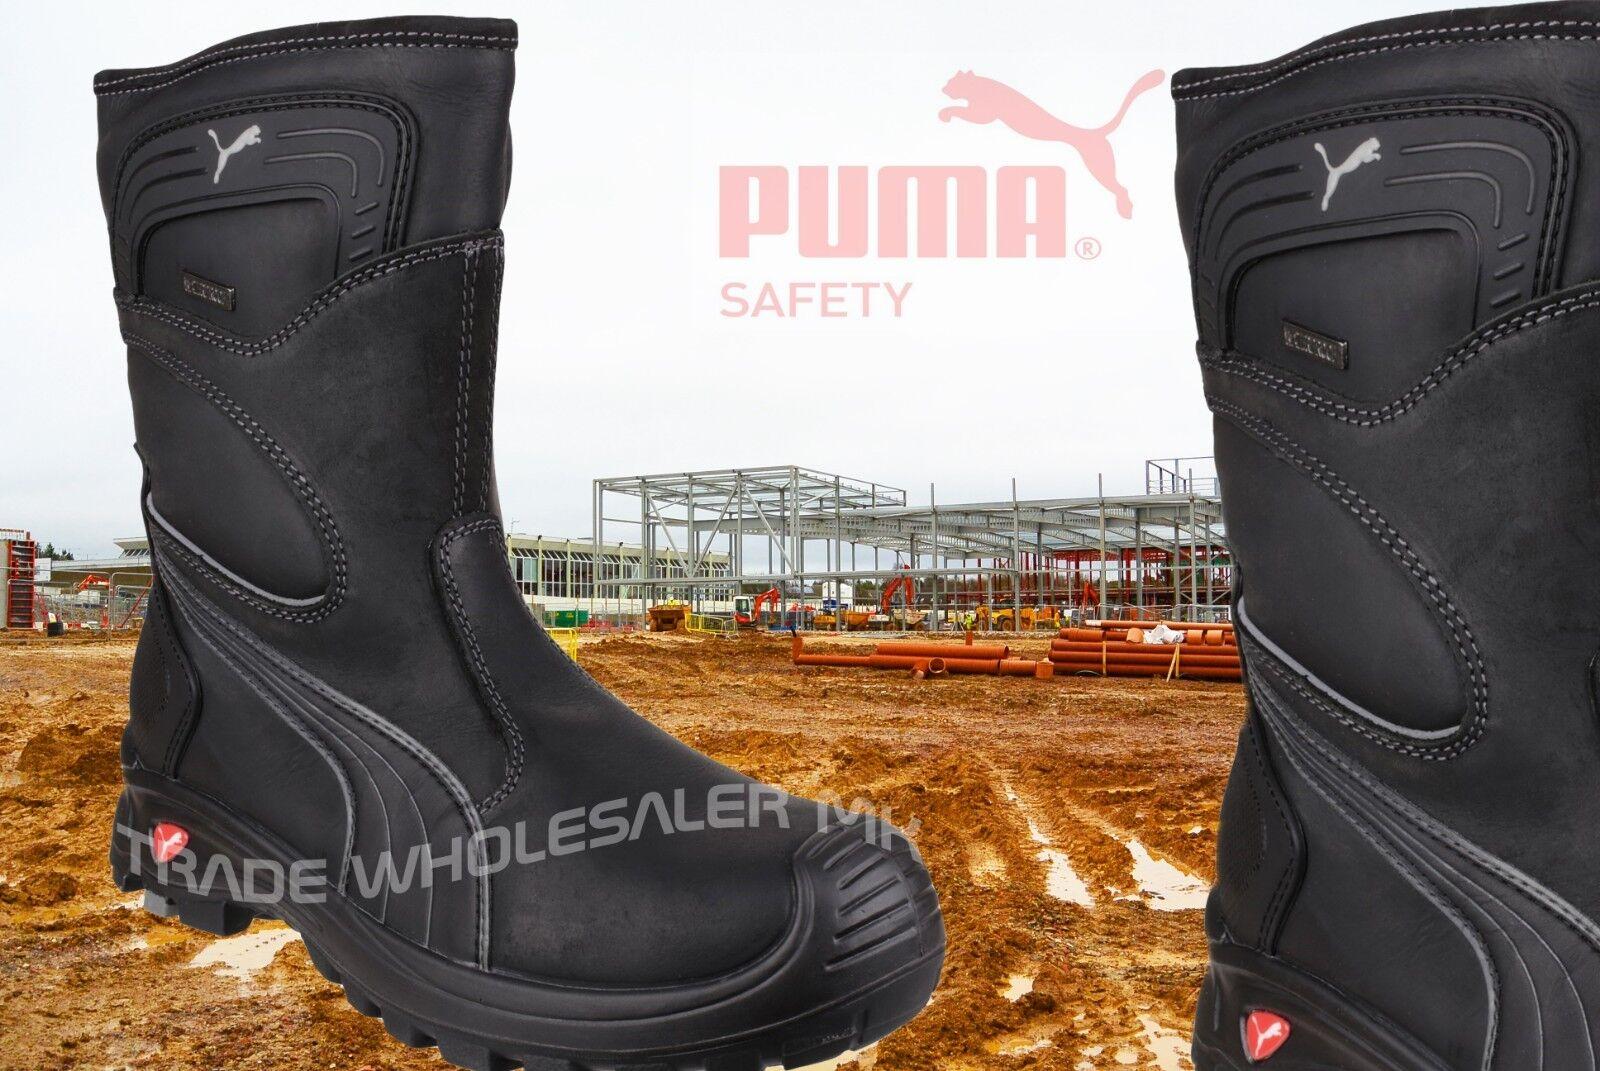 7147a3b350d Puma Rigger Industrial Mens S3 Safety Composite Metal Free Toe Cap Boots